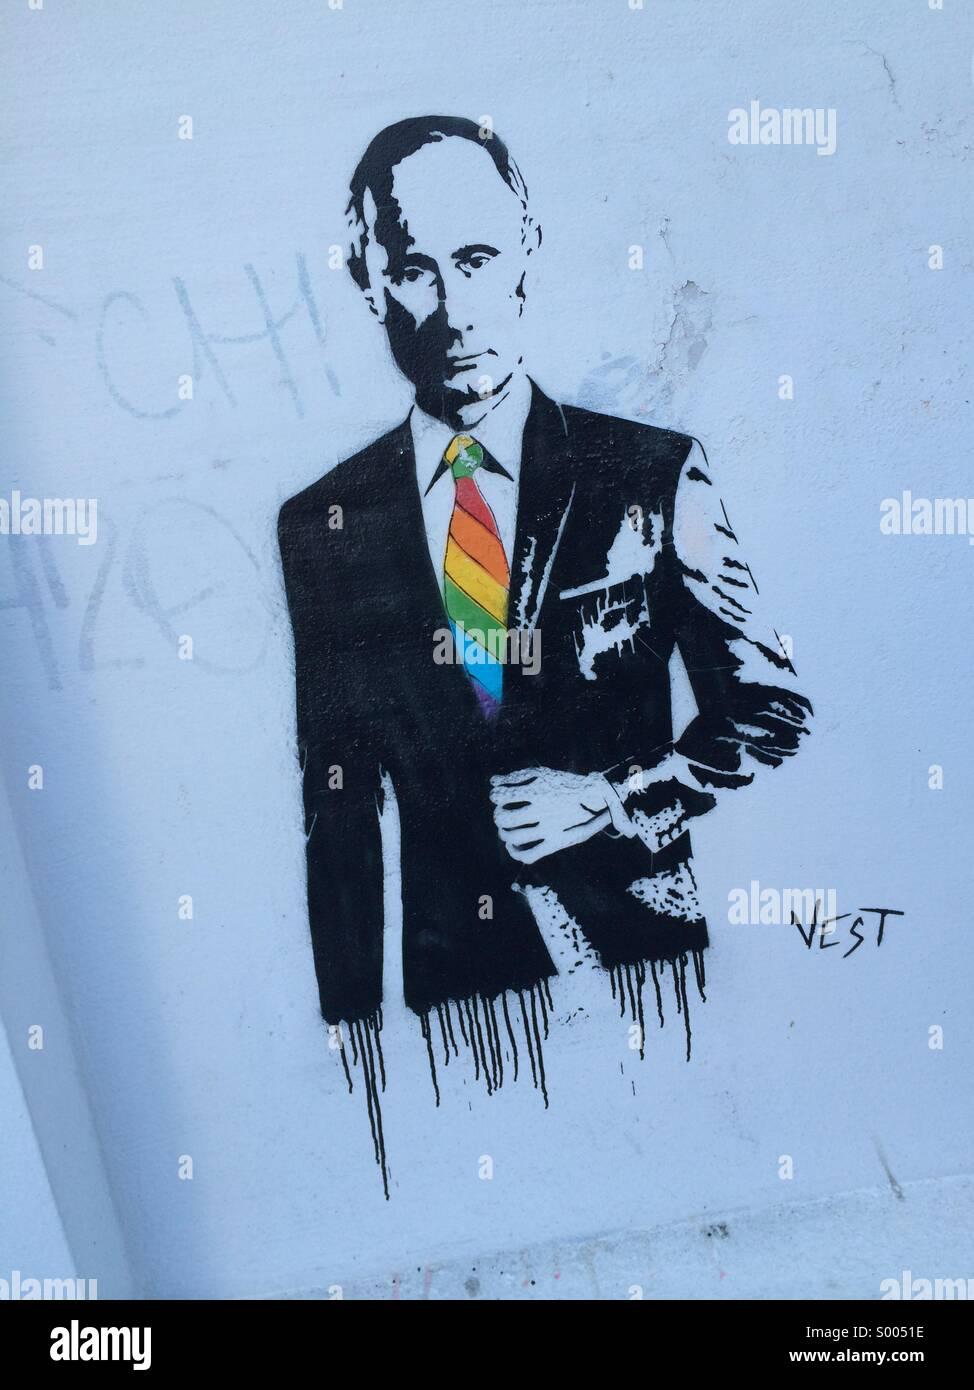 Vladimir Putin looking absolutely fabulous with his gay, rainbow tie. - Stock Image